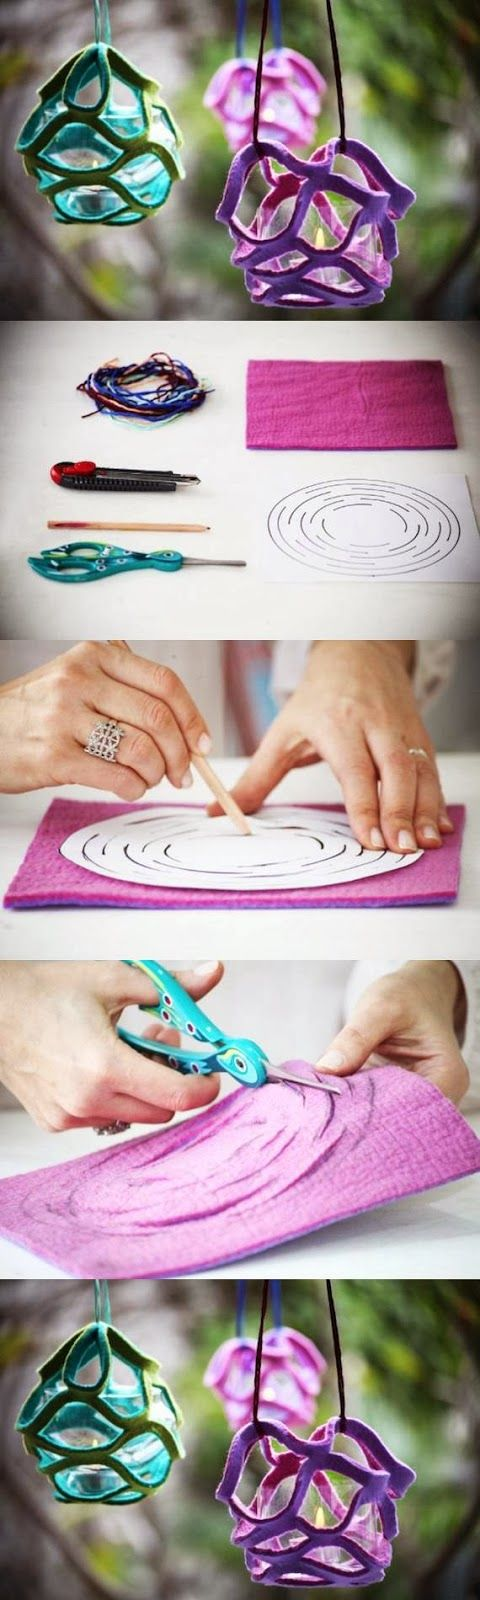 DIY : Felt Candle Holder | DIY & Crafts Tutorials